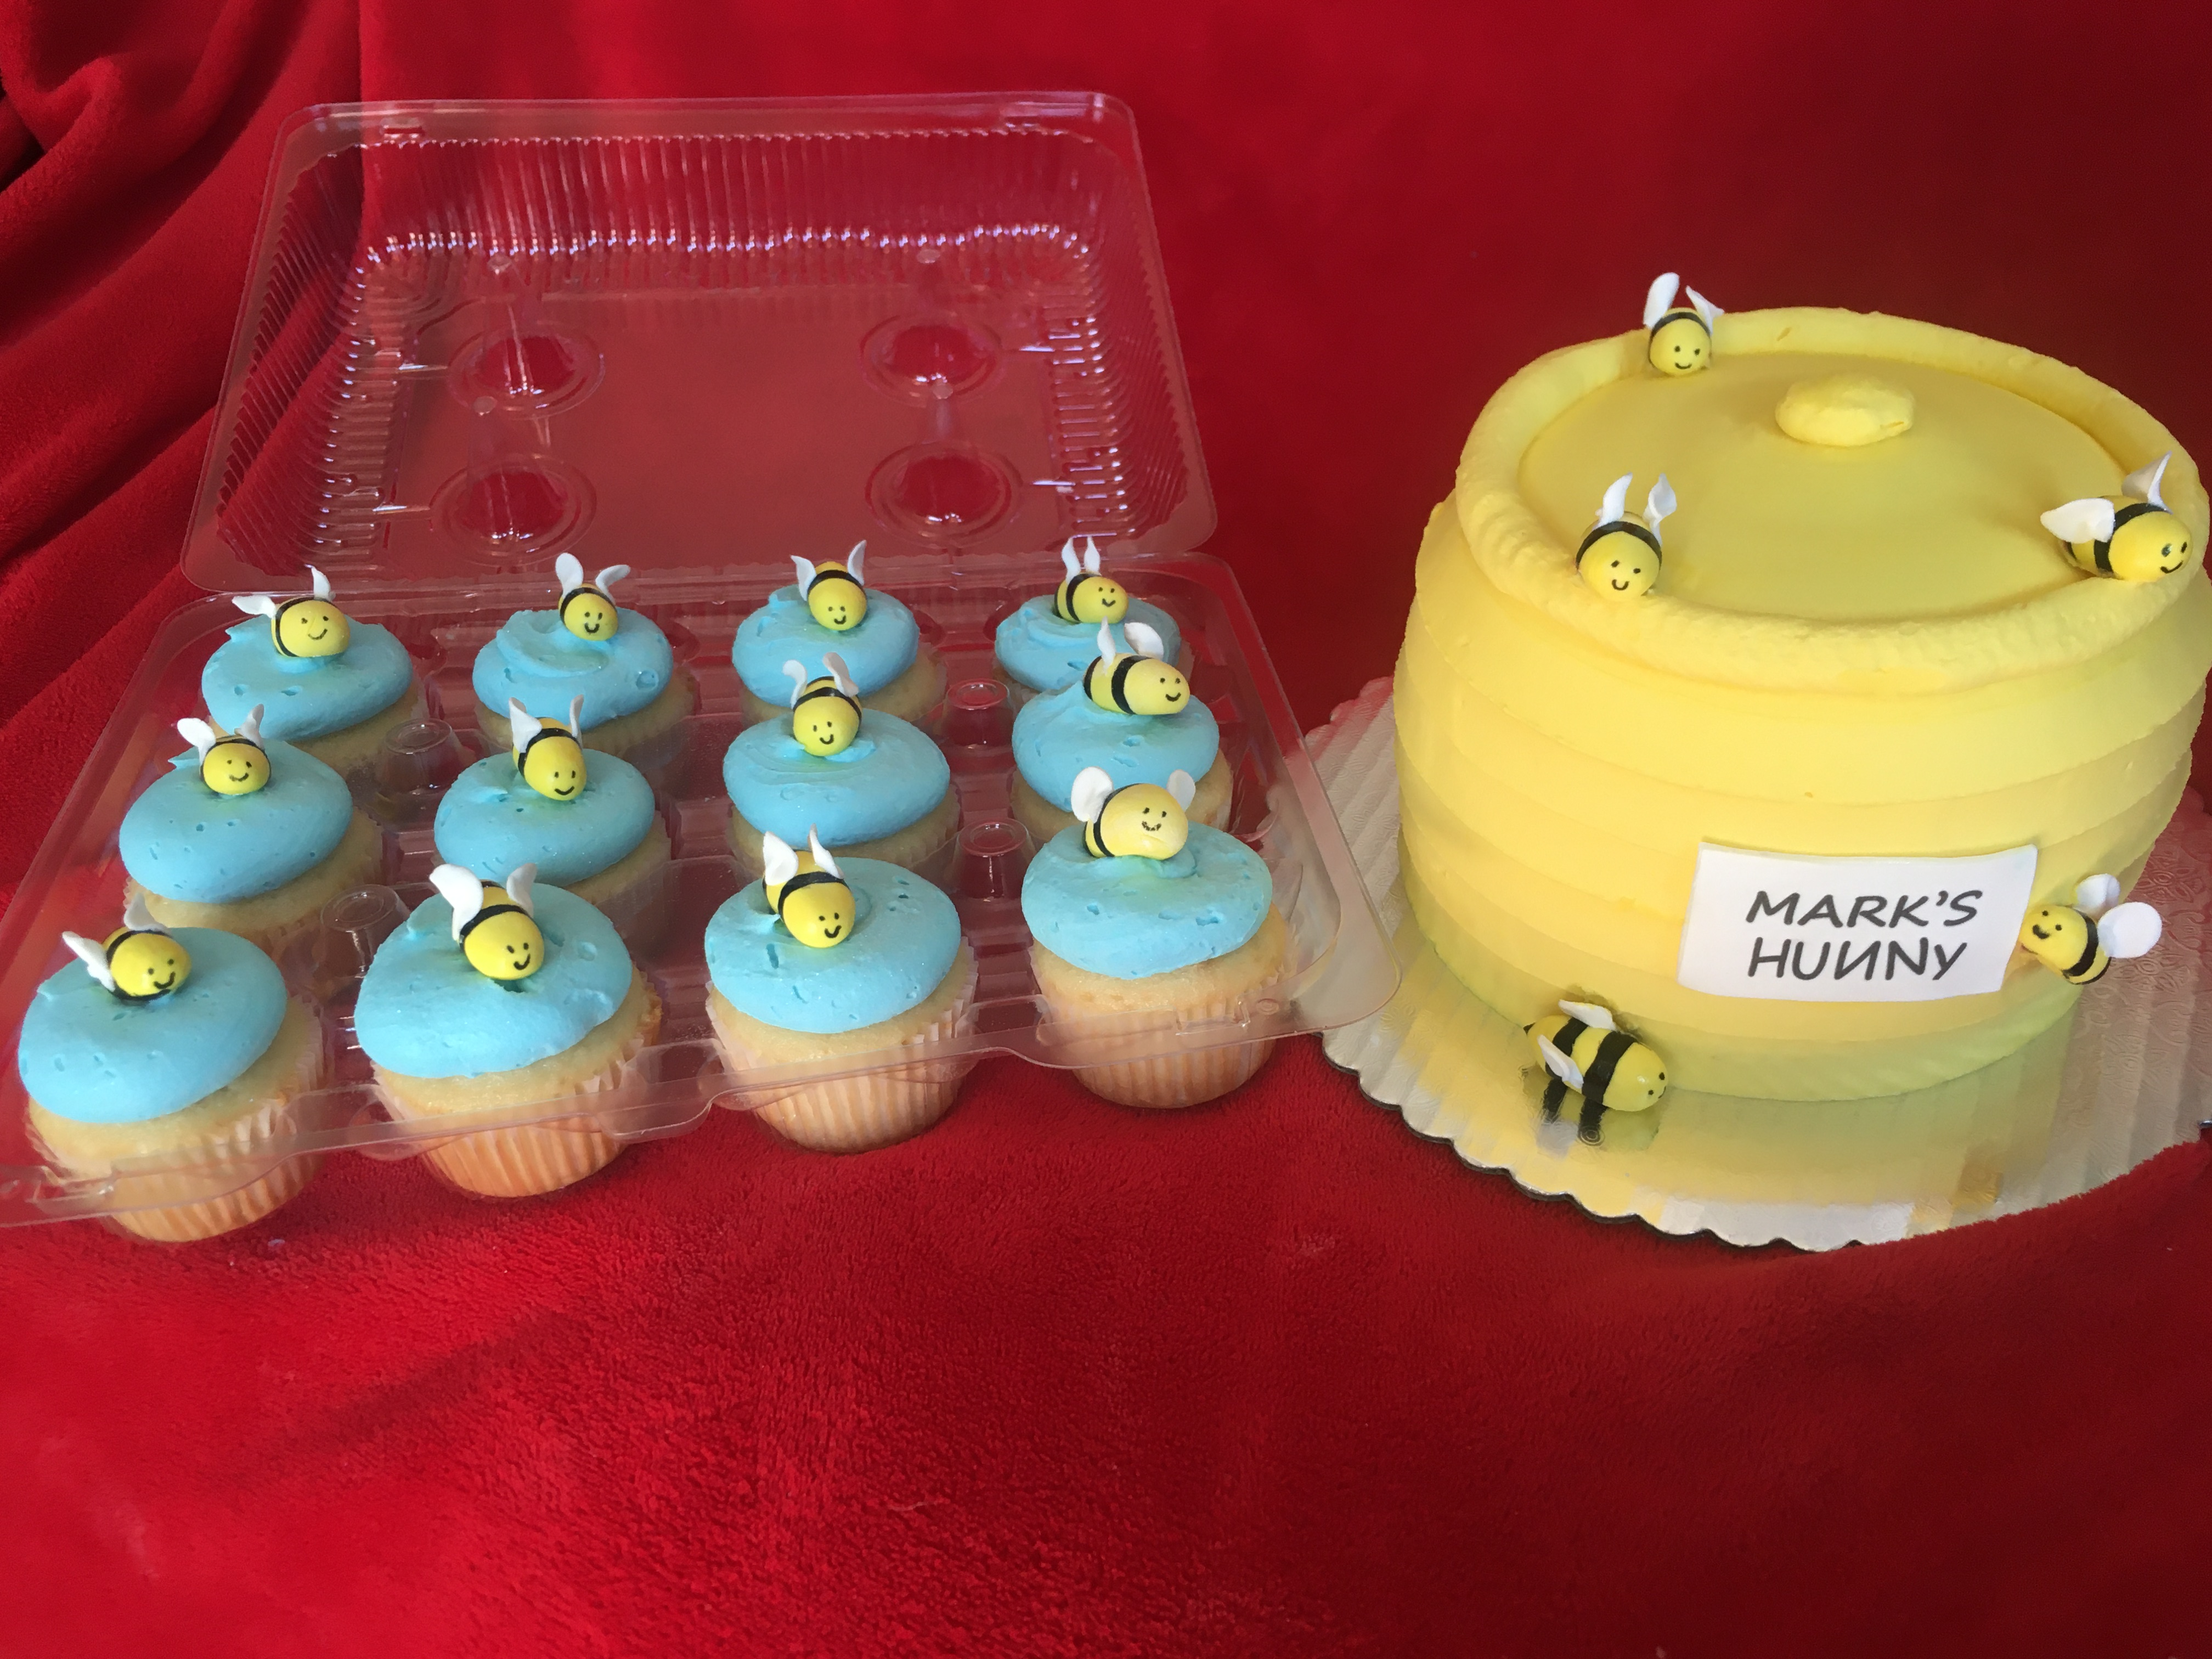 Hunny Pot and Cupcakes